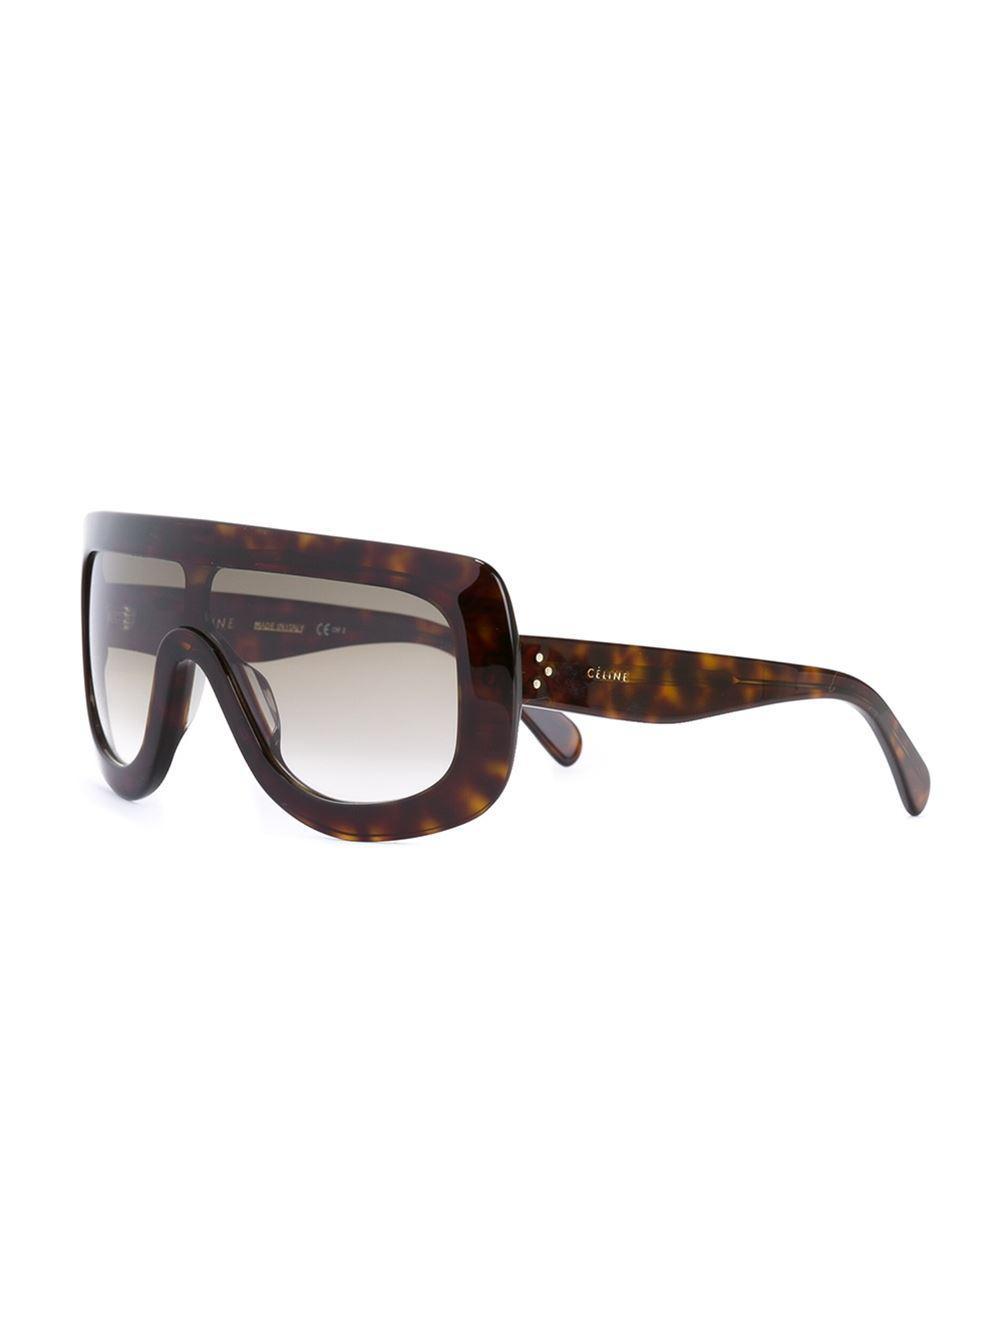 713f4c814b43 Céline  adele  Sunglasses in Black - Lyst